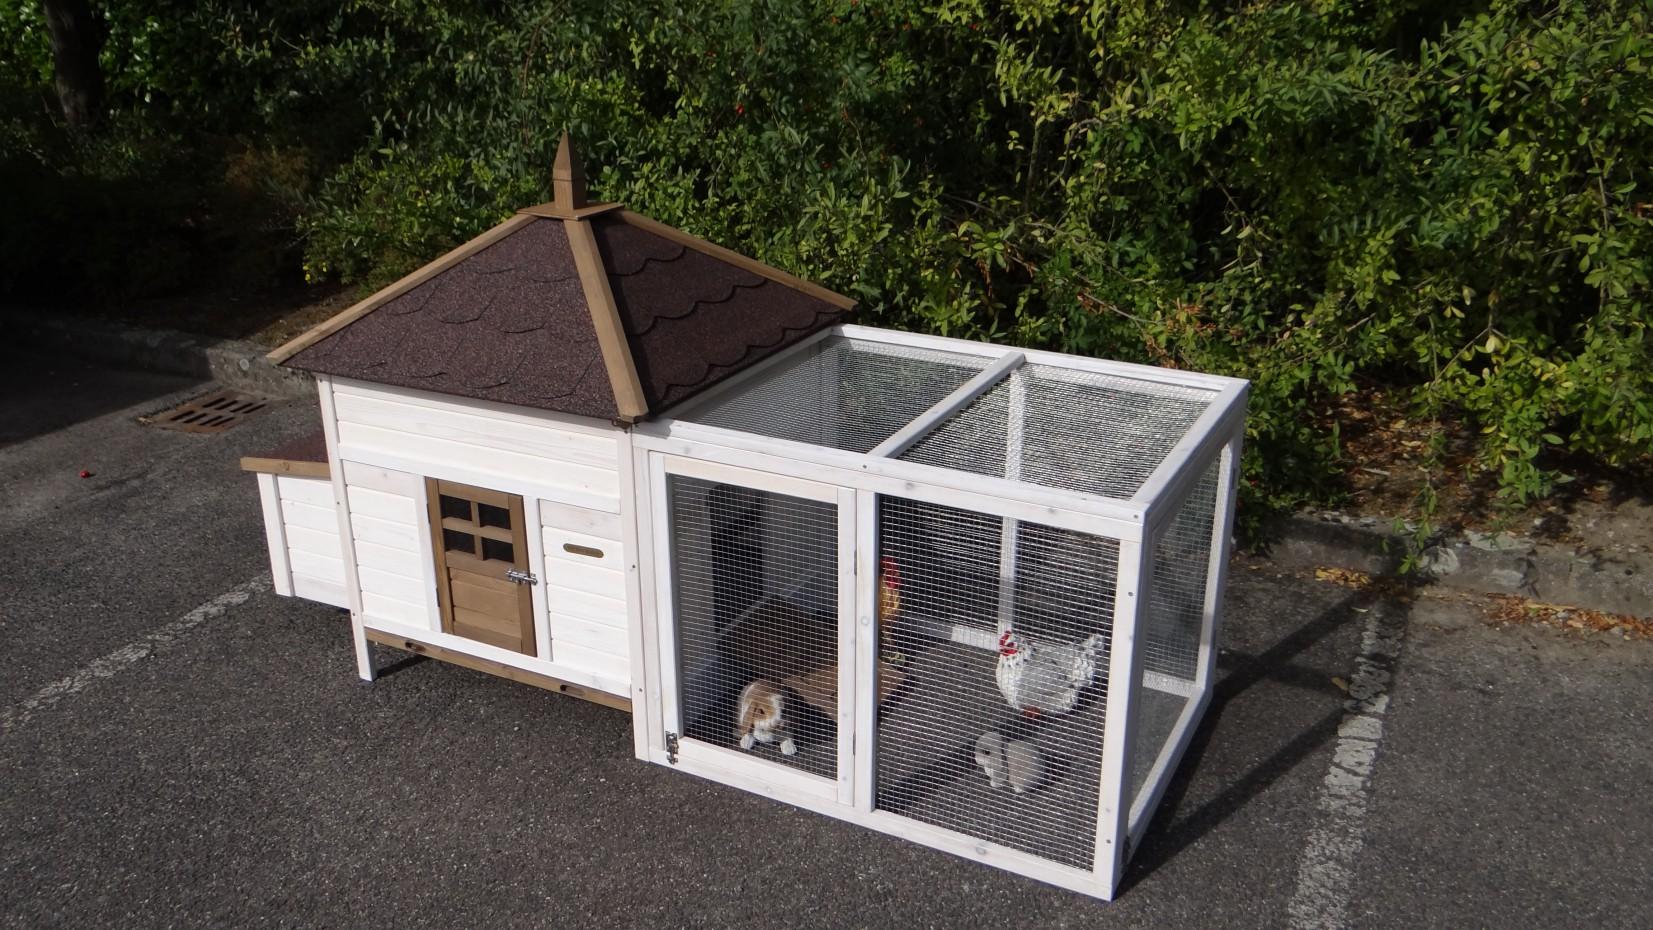 h hnerstall ambiance large mit anbau auslauf. Black Bedroom Furniture Sets. Home Design Ideas